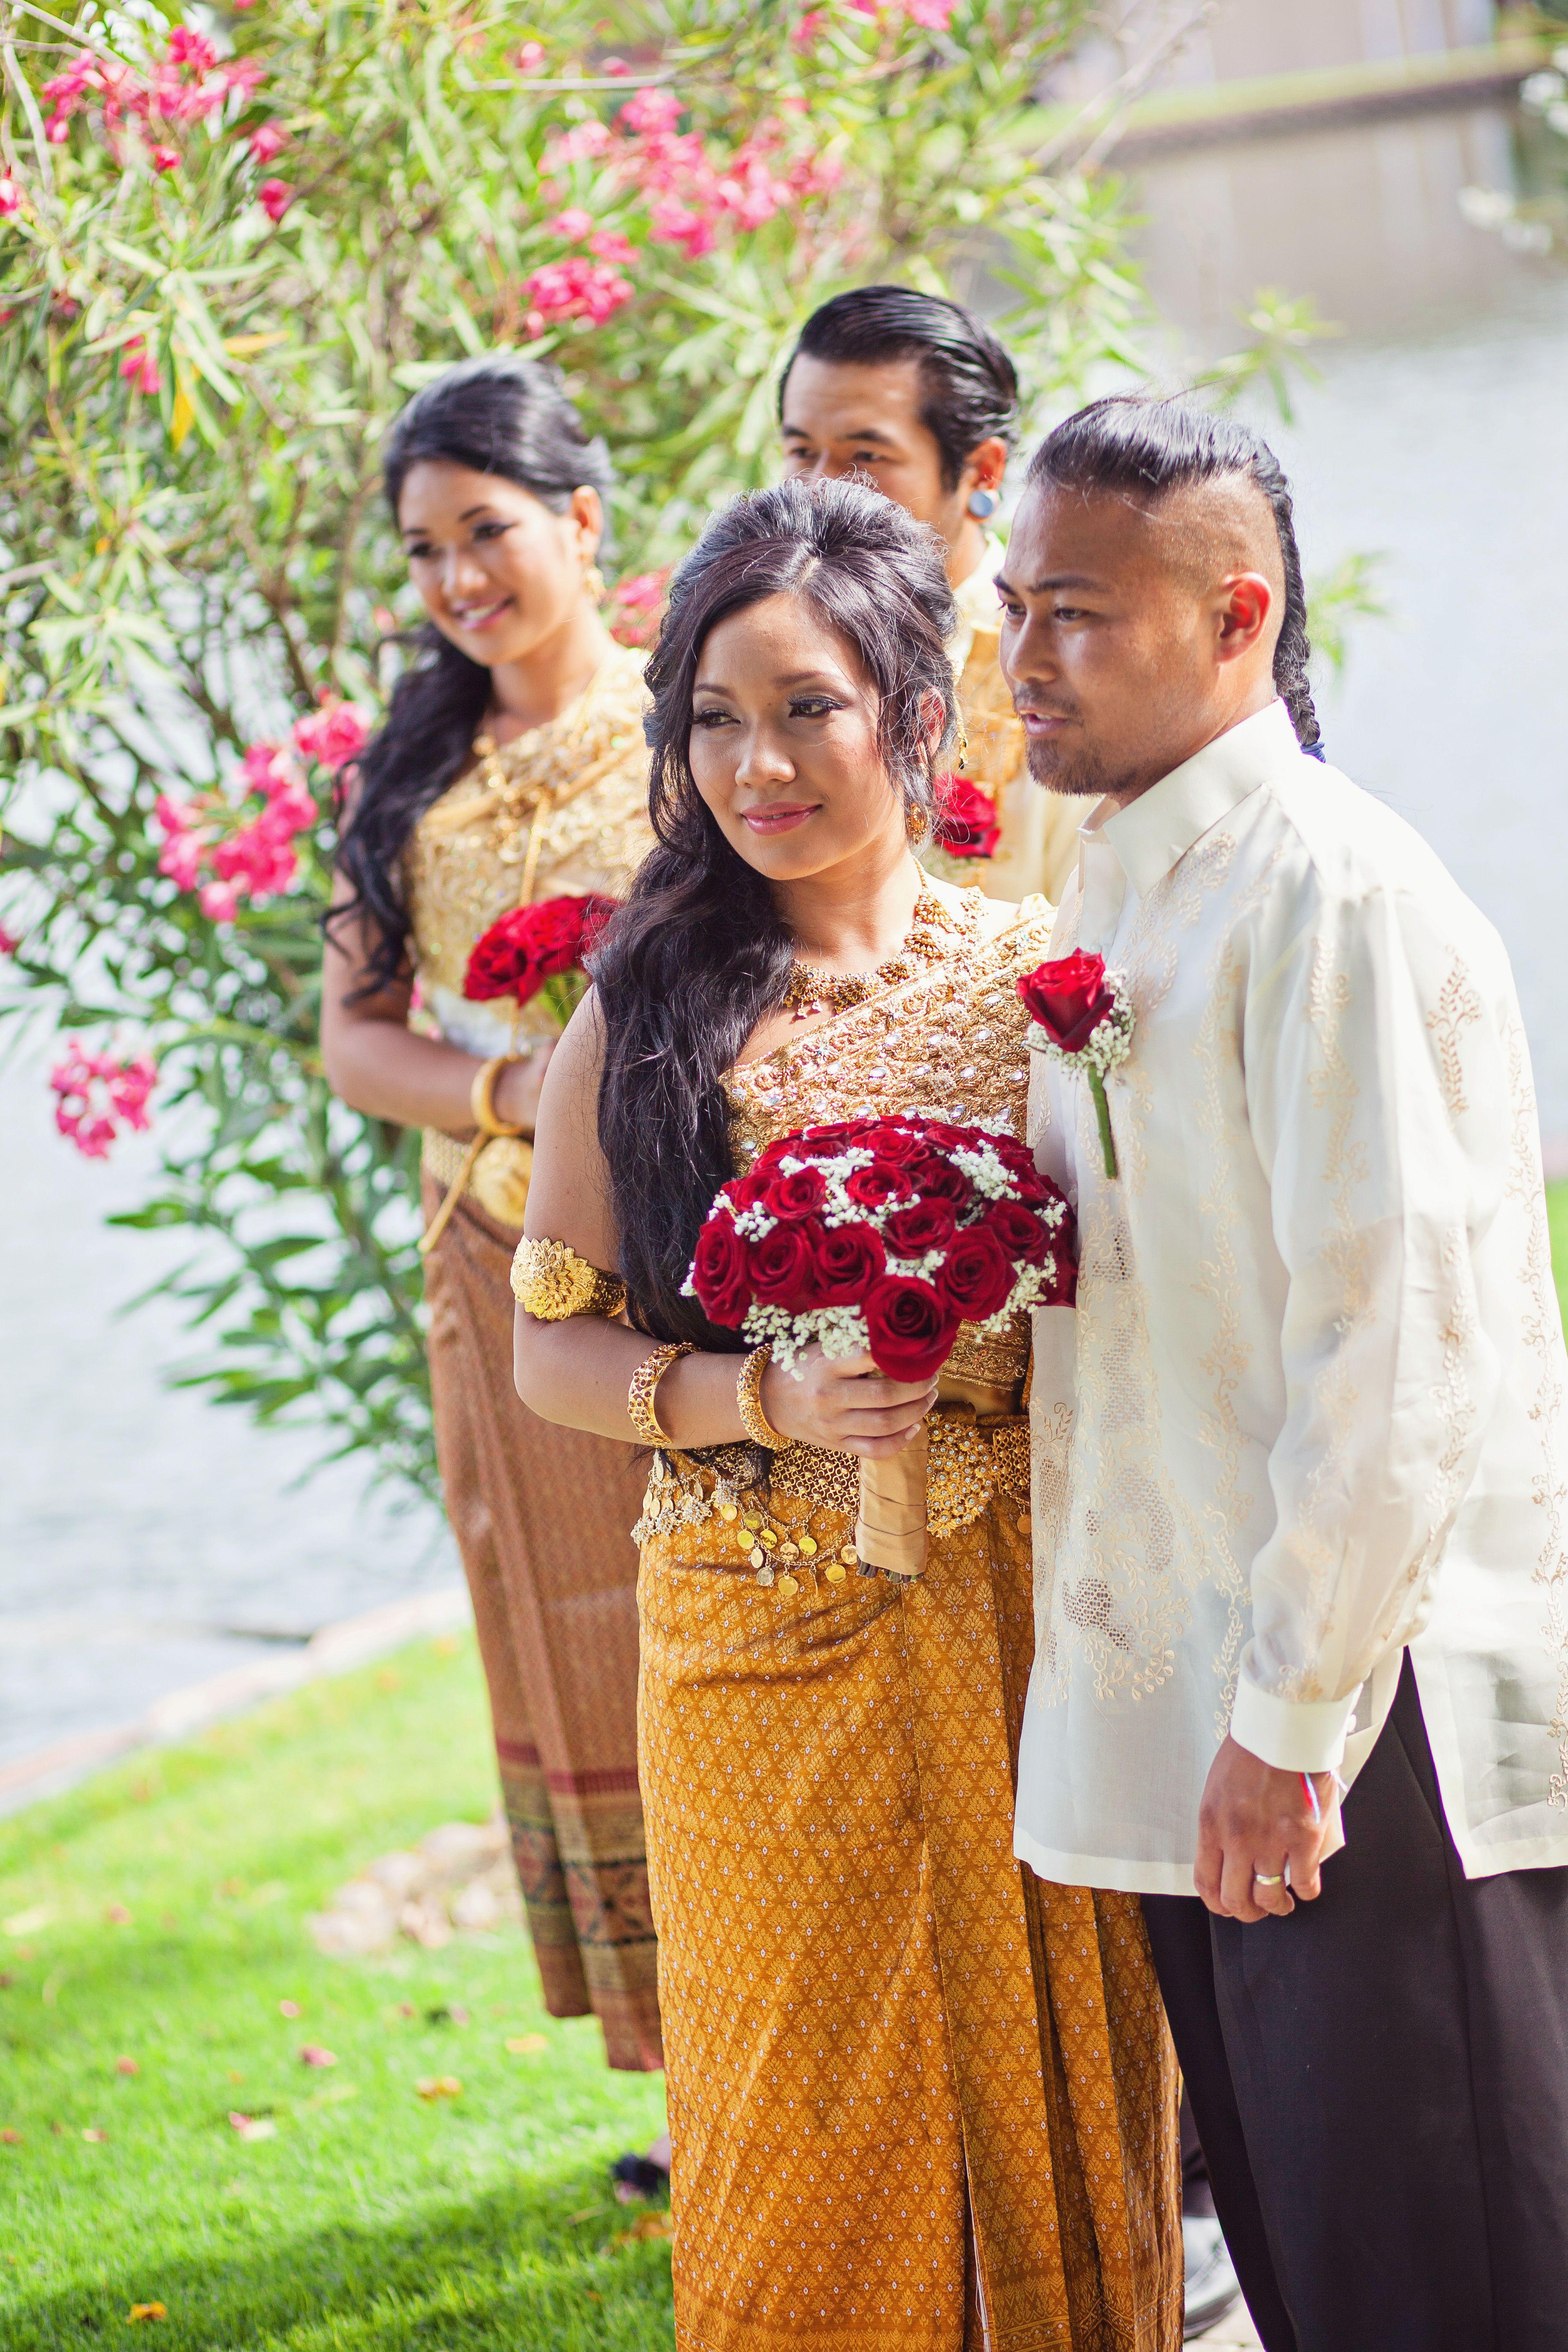 Khmer Wedding Bride And Groom Gold